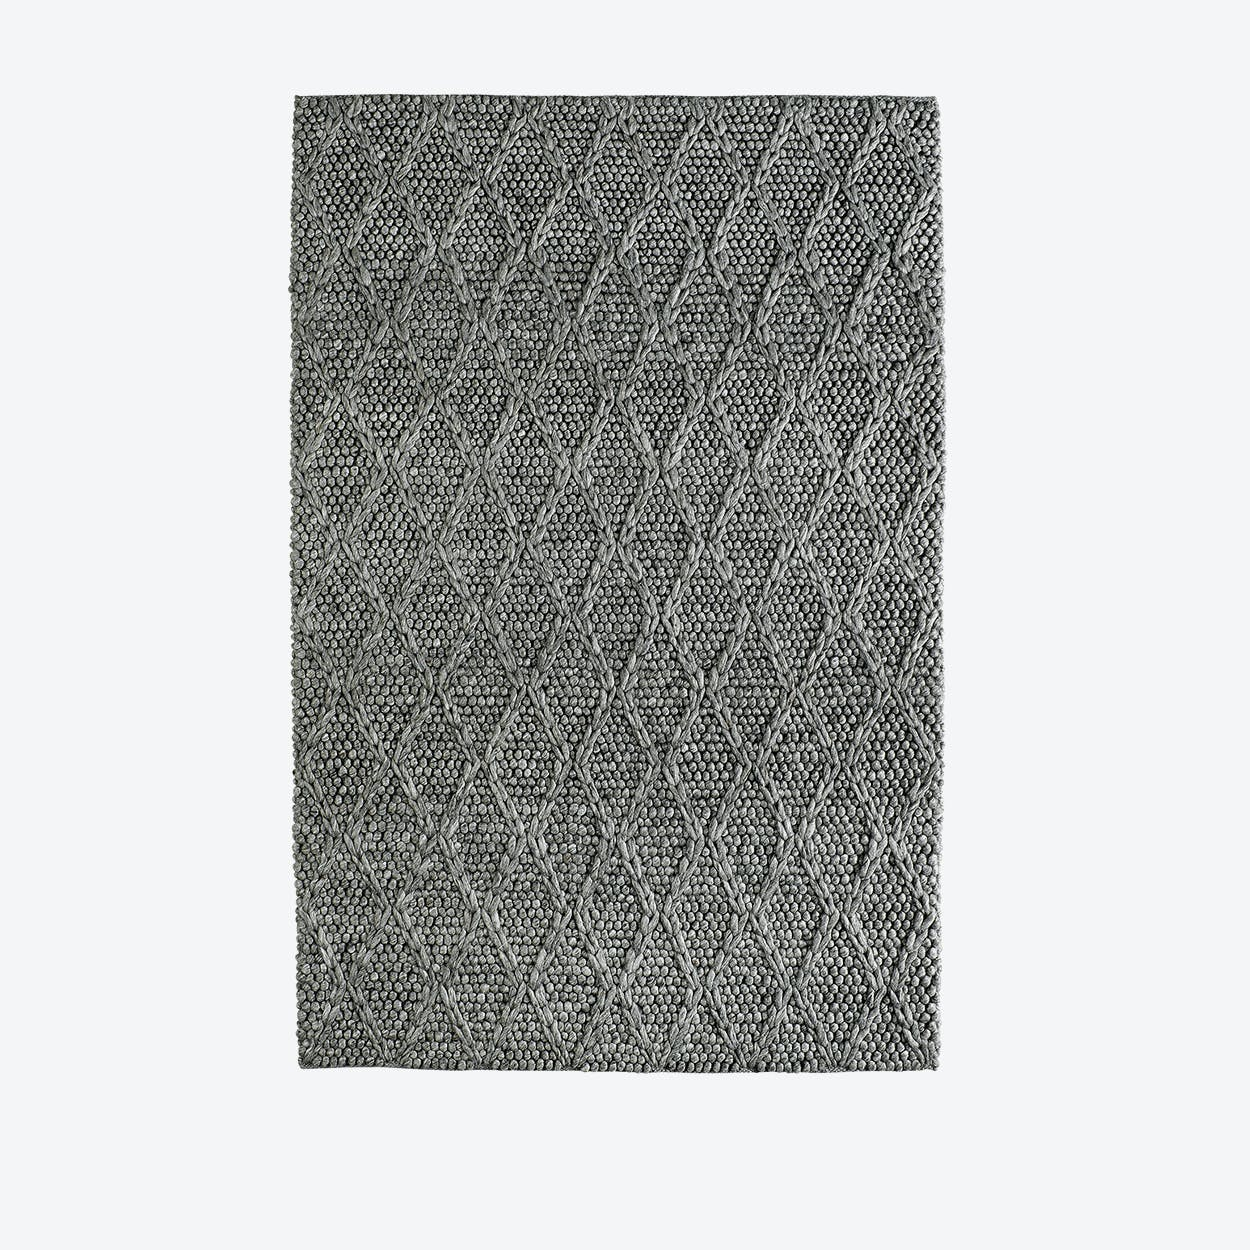 My Studio 620 Graphite Rug